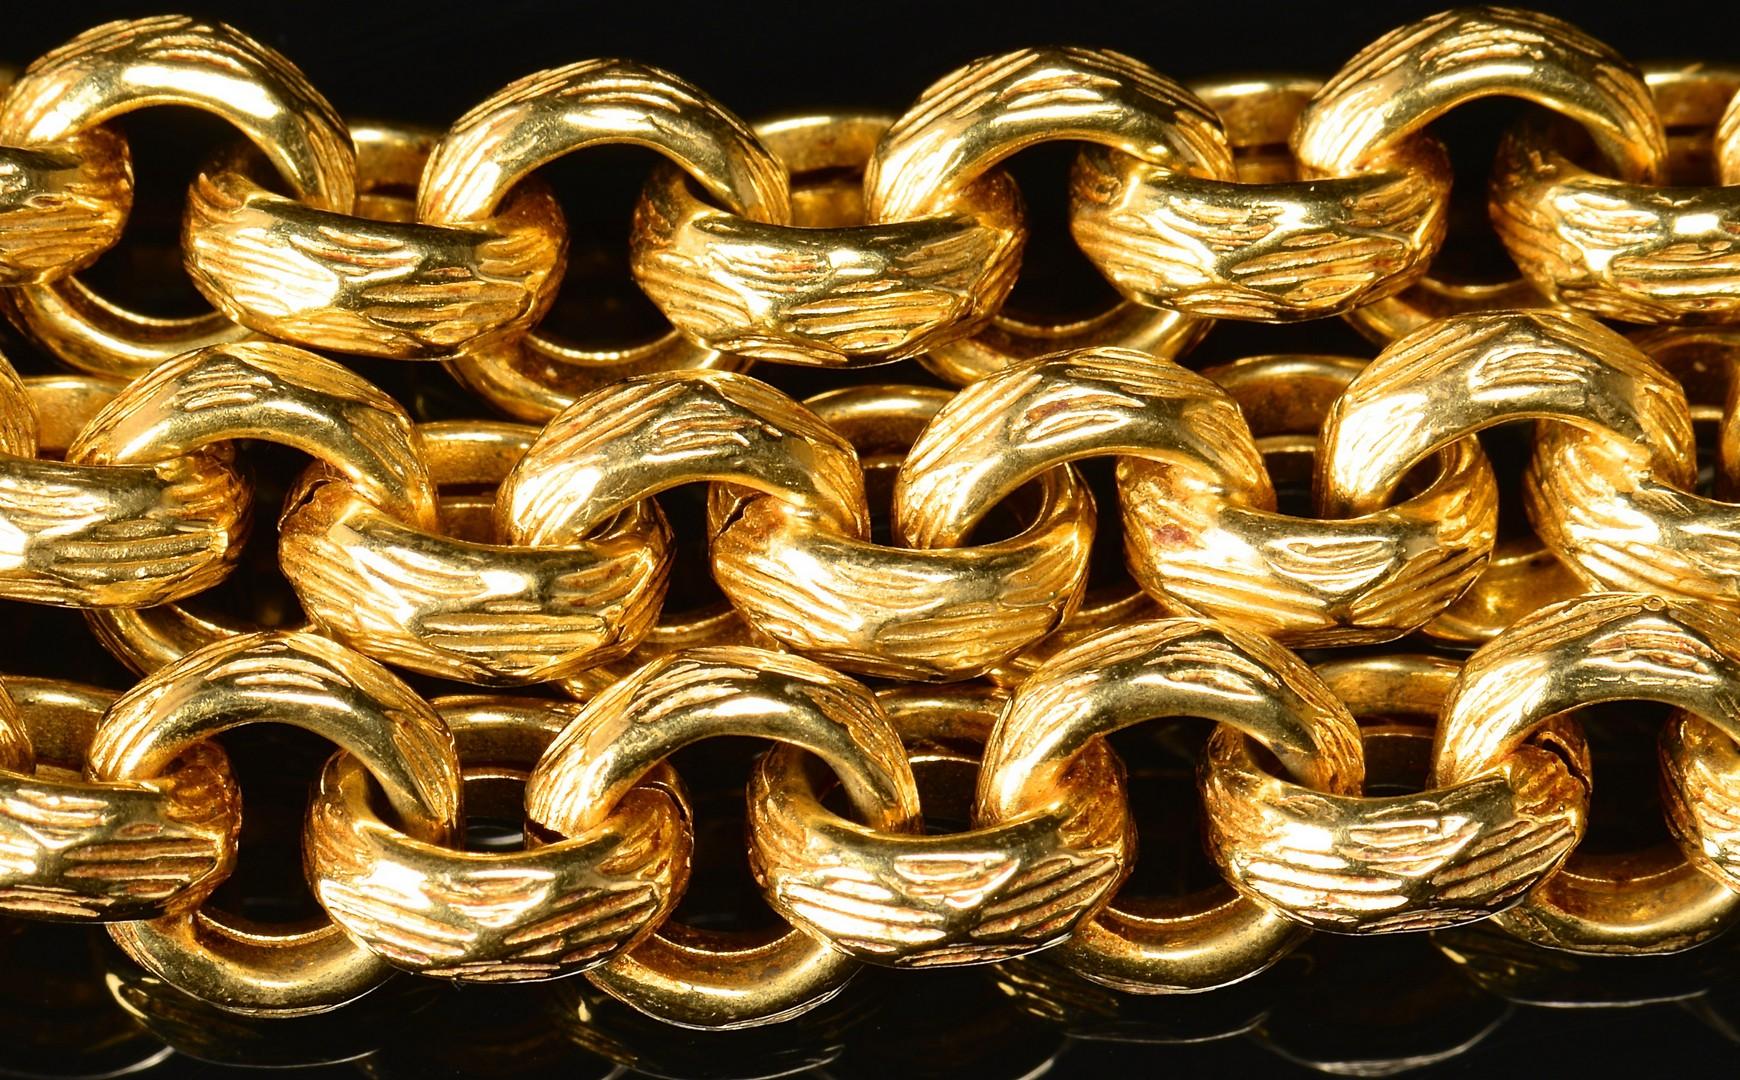 Lot 75: 18K Gold Italian Link Necklace